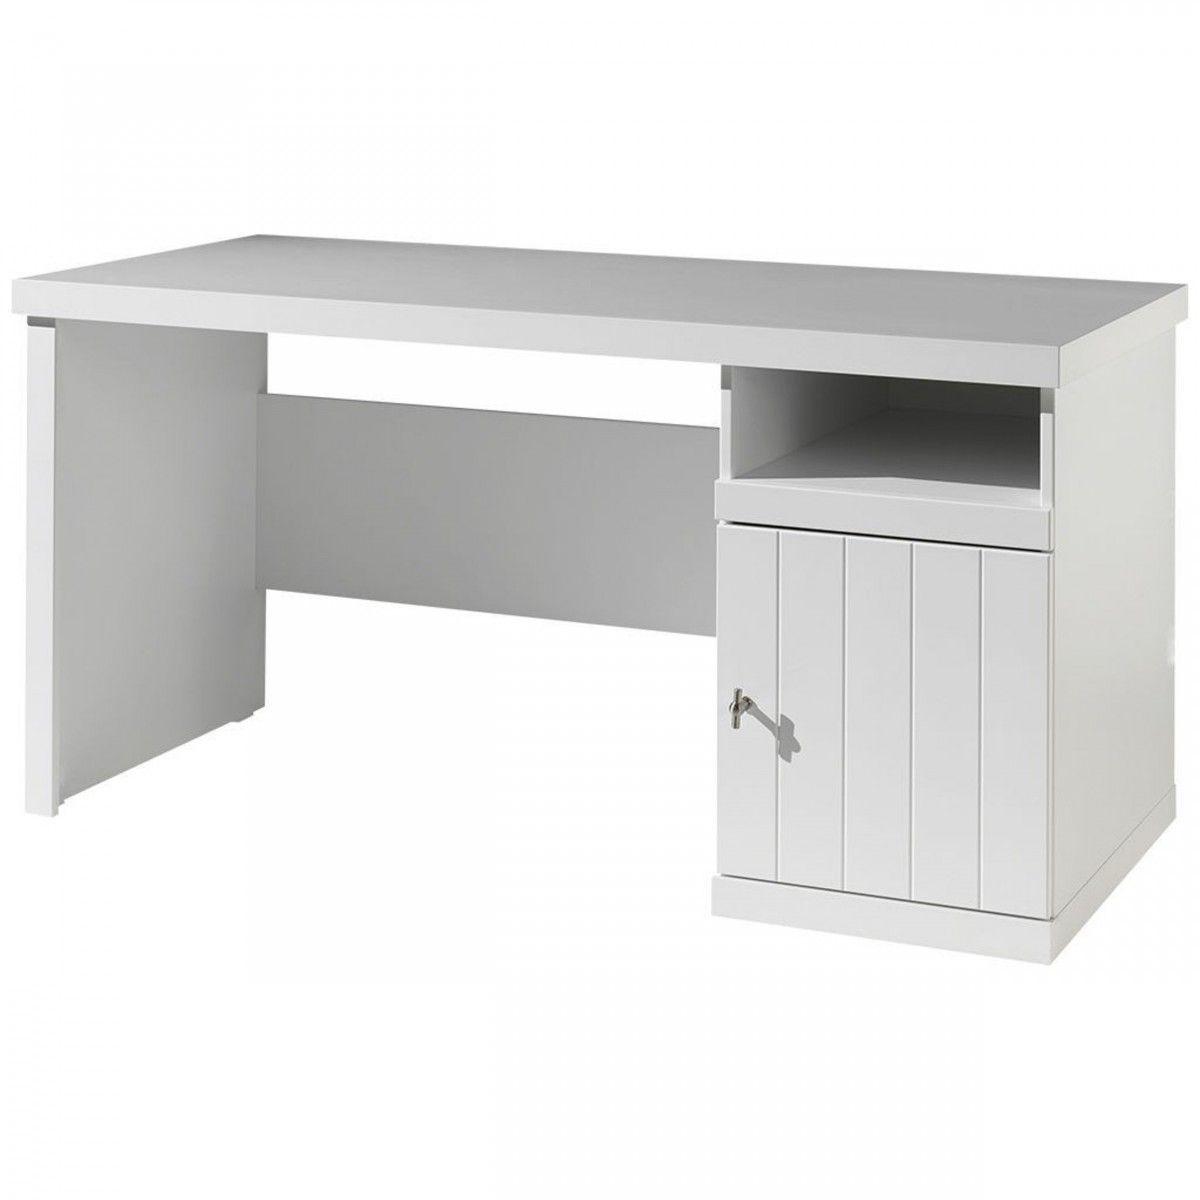 terre bureau en bois blanc mgve bu1011 de nuit. Black Bedroom Furniture Sets. Home Design Ideas